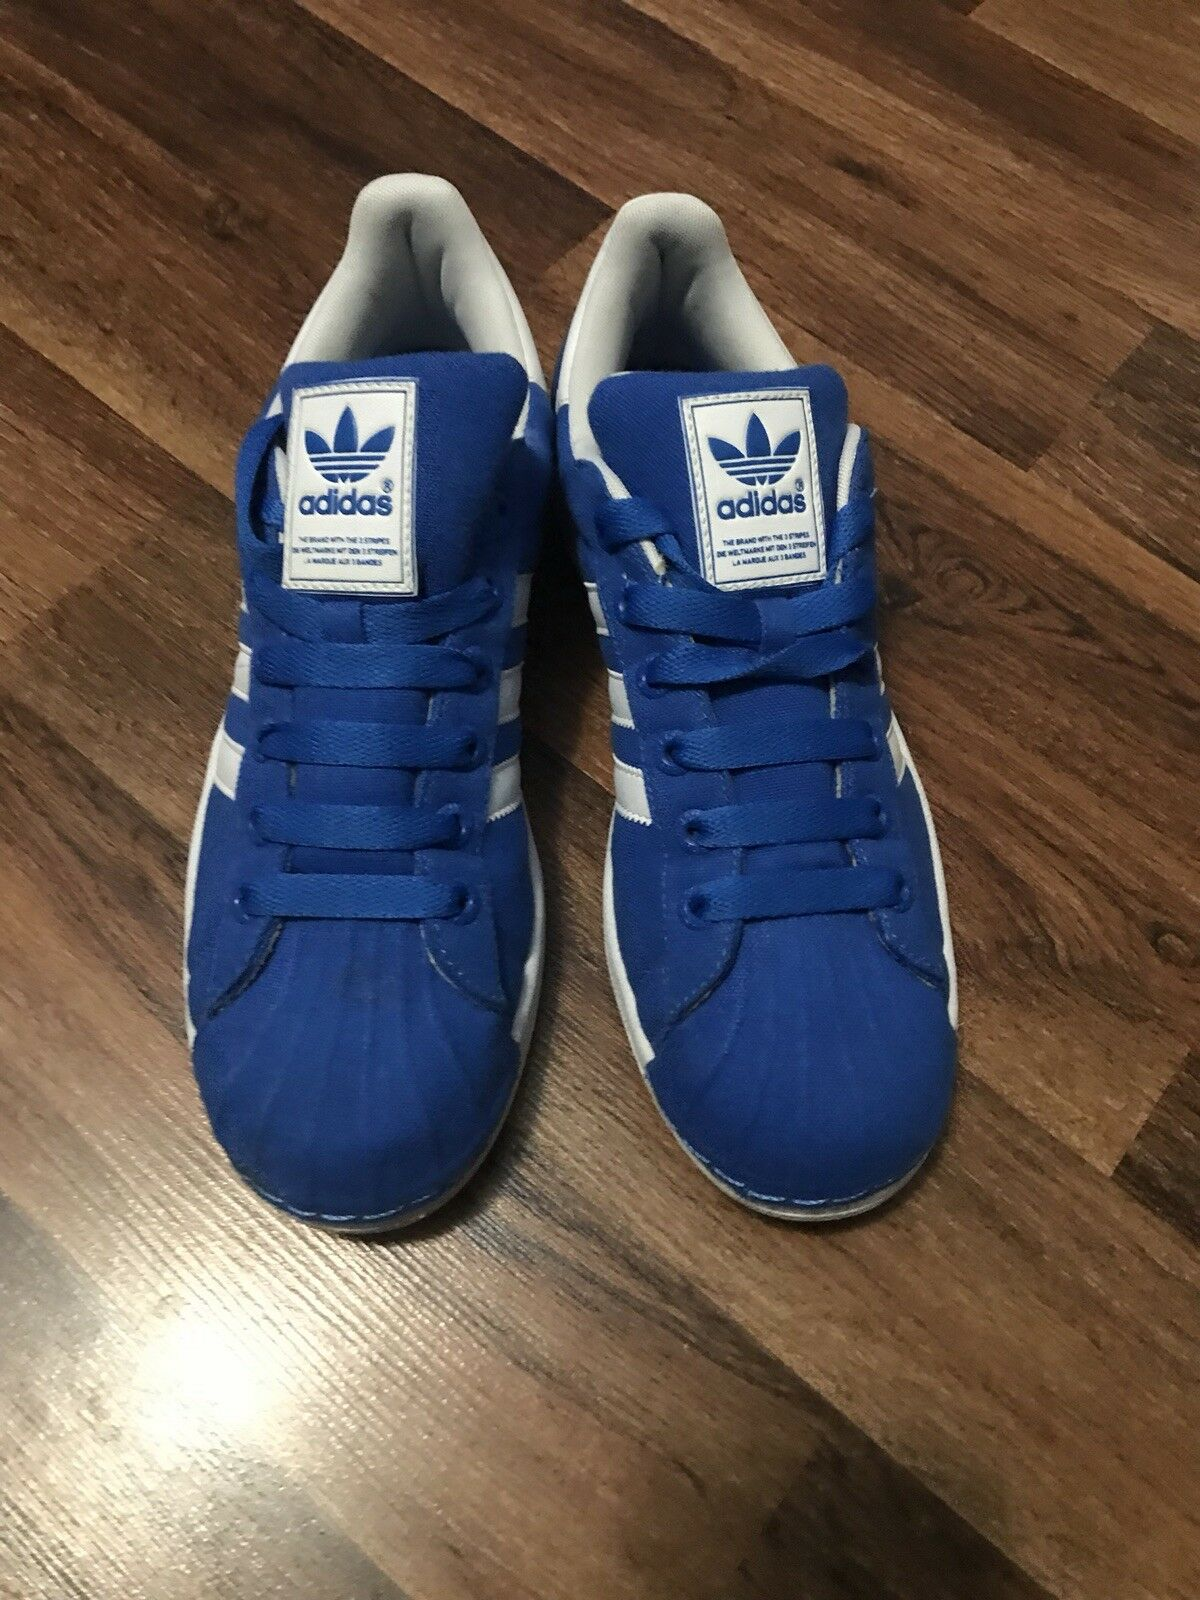 Adidas schuhe herren 3 größe 9 / 3 herren blaue turnschuhe. 36b9be